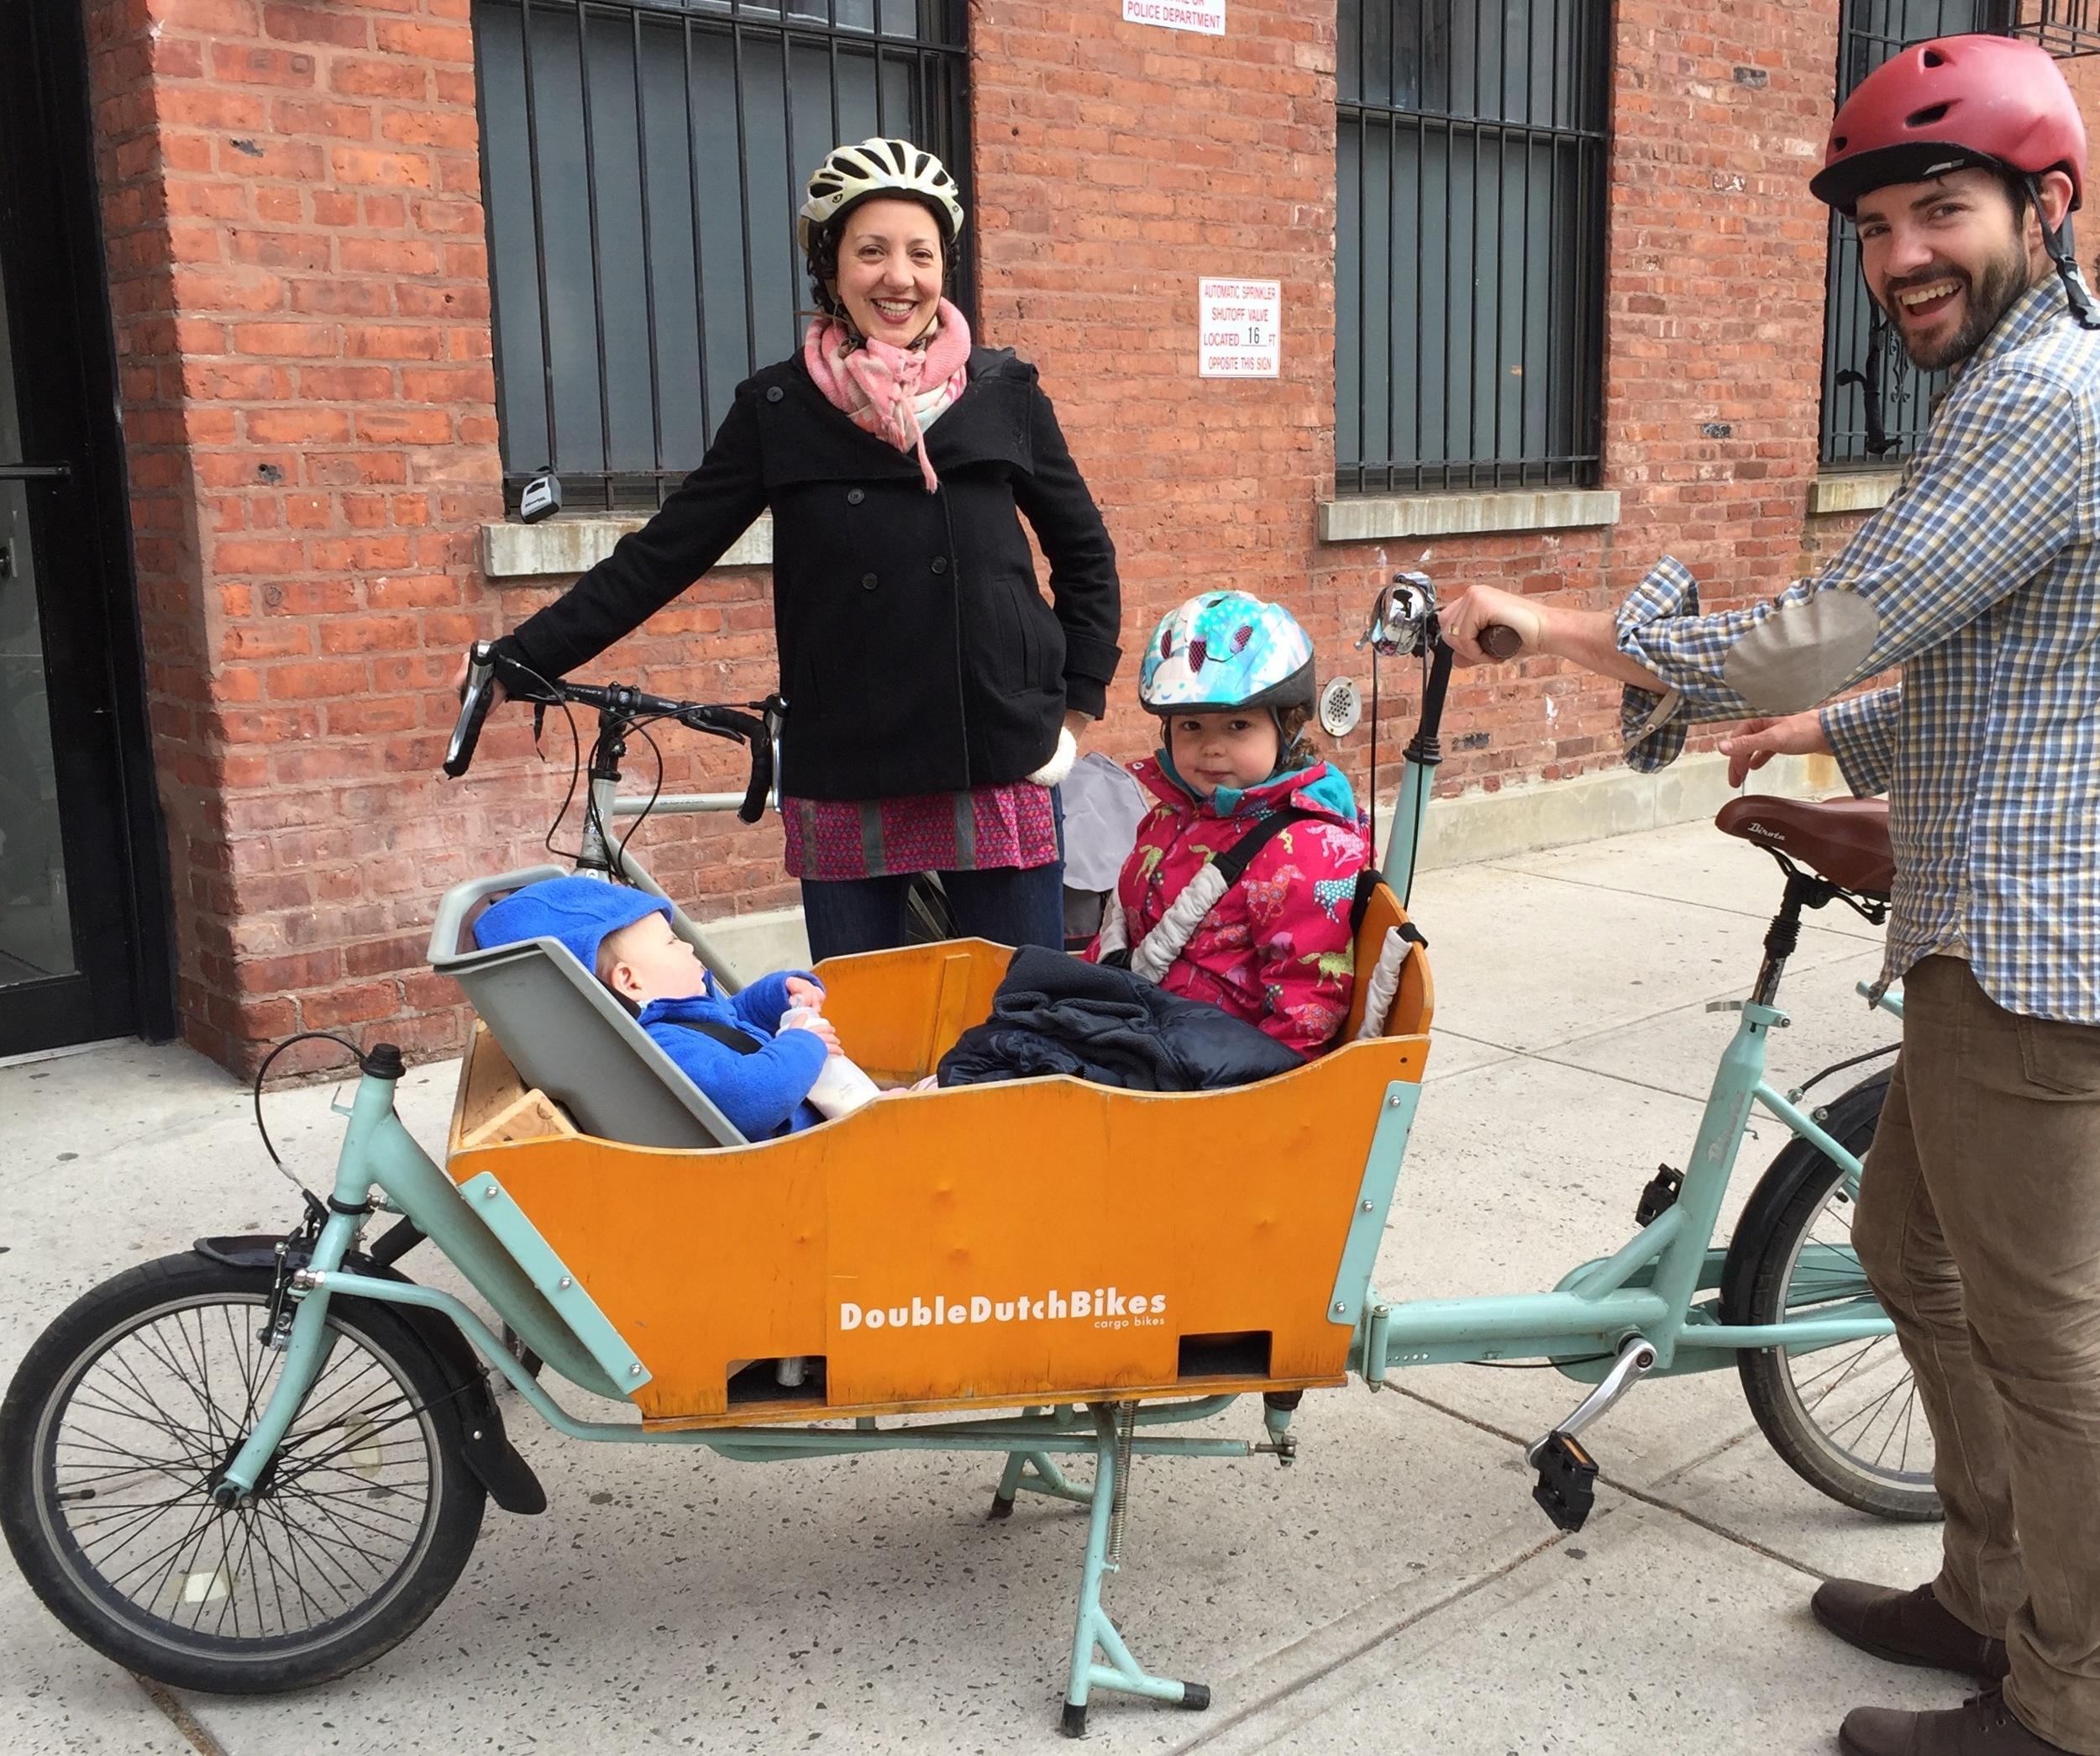 Gotta love the cargo bike!